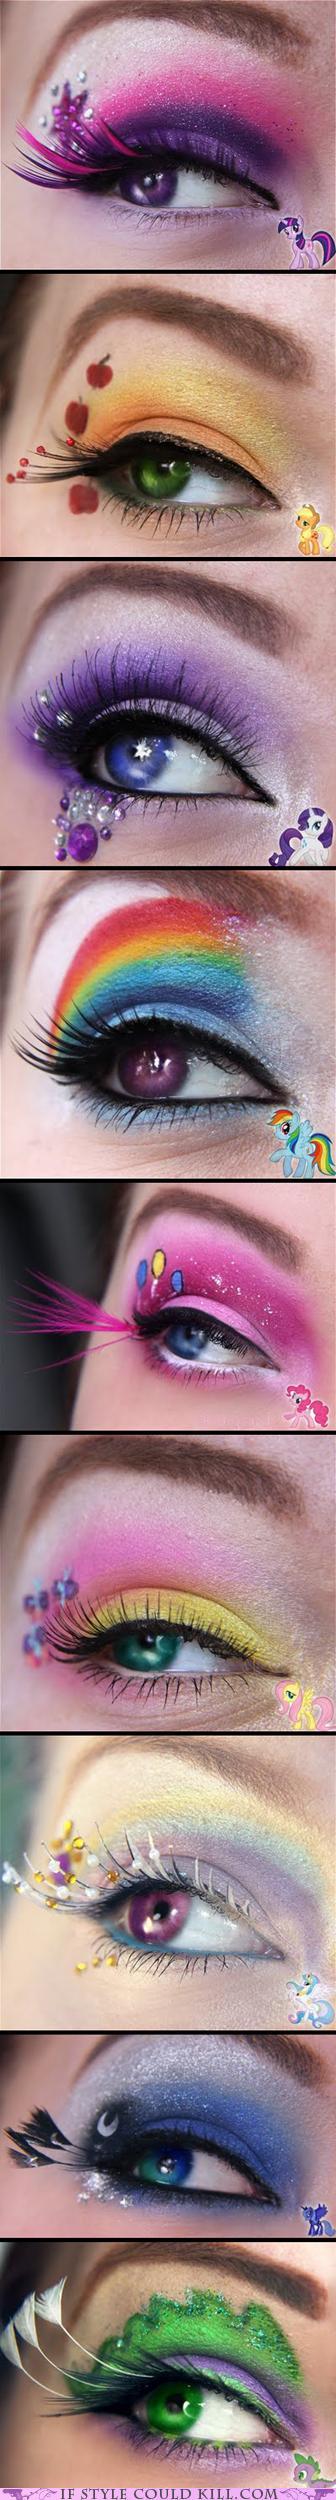 MLP: FiM eye make-up!